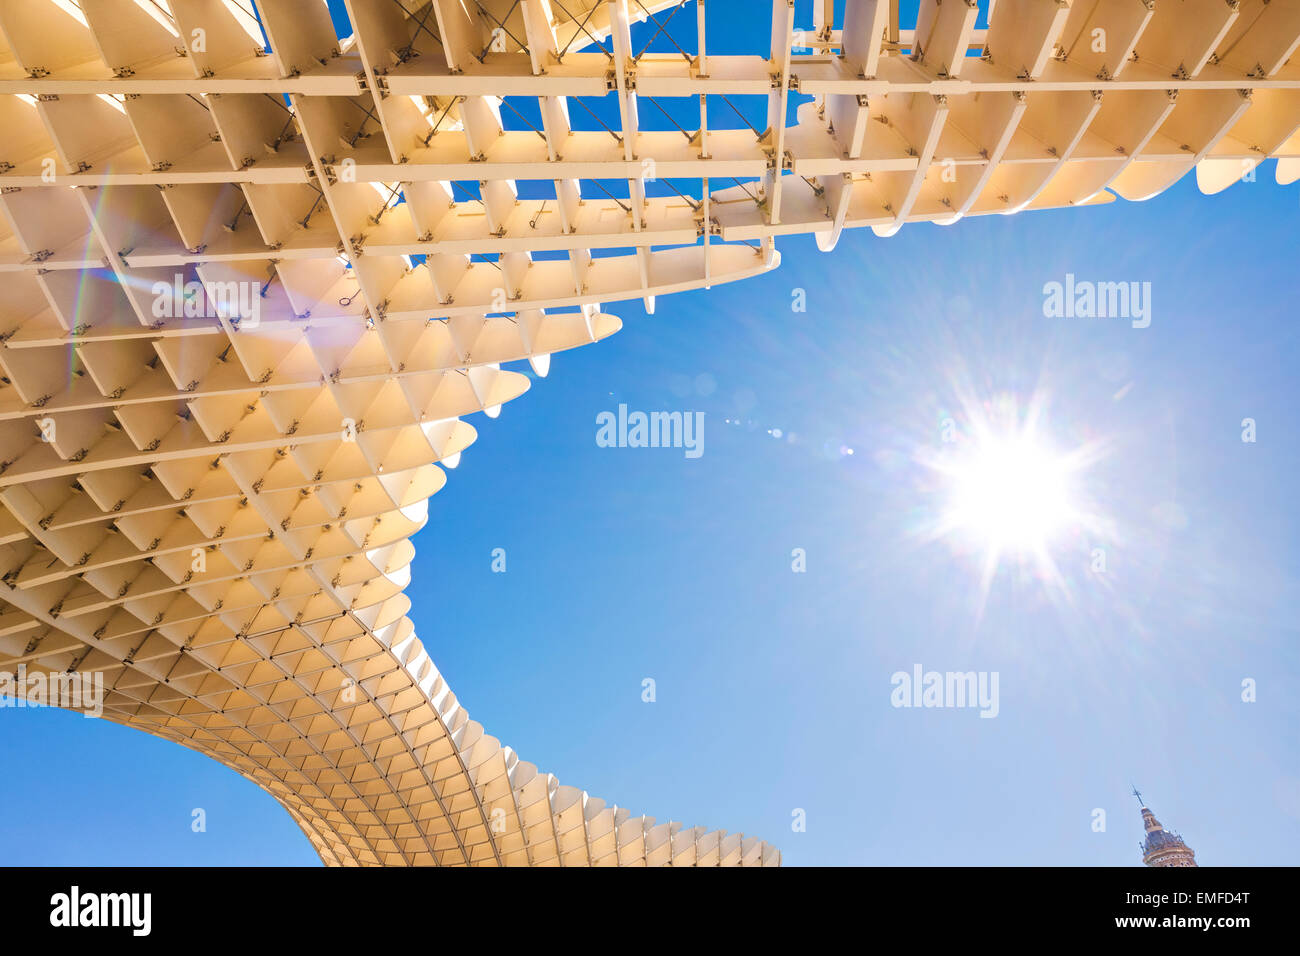 Las Setas de la Encarnacion, or Sevilla Metropol Parasol modern wood structure in Seville Spain - Stock Image